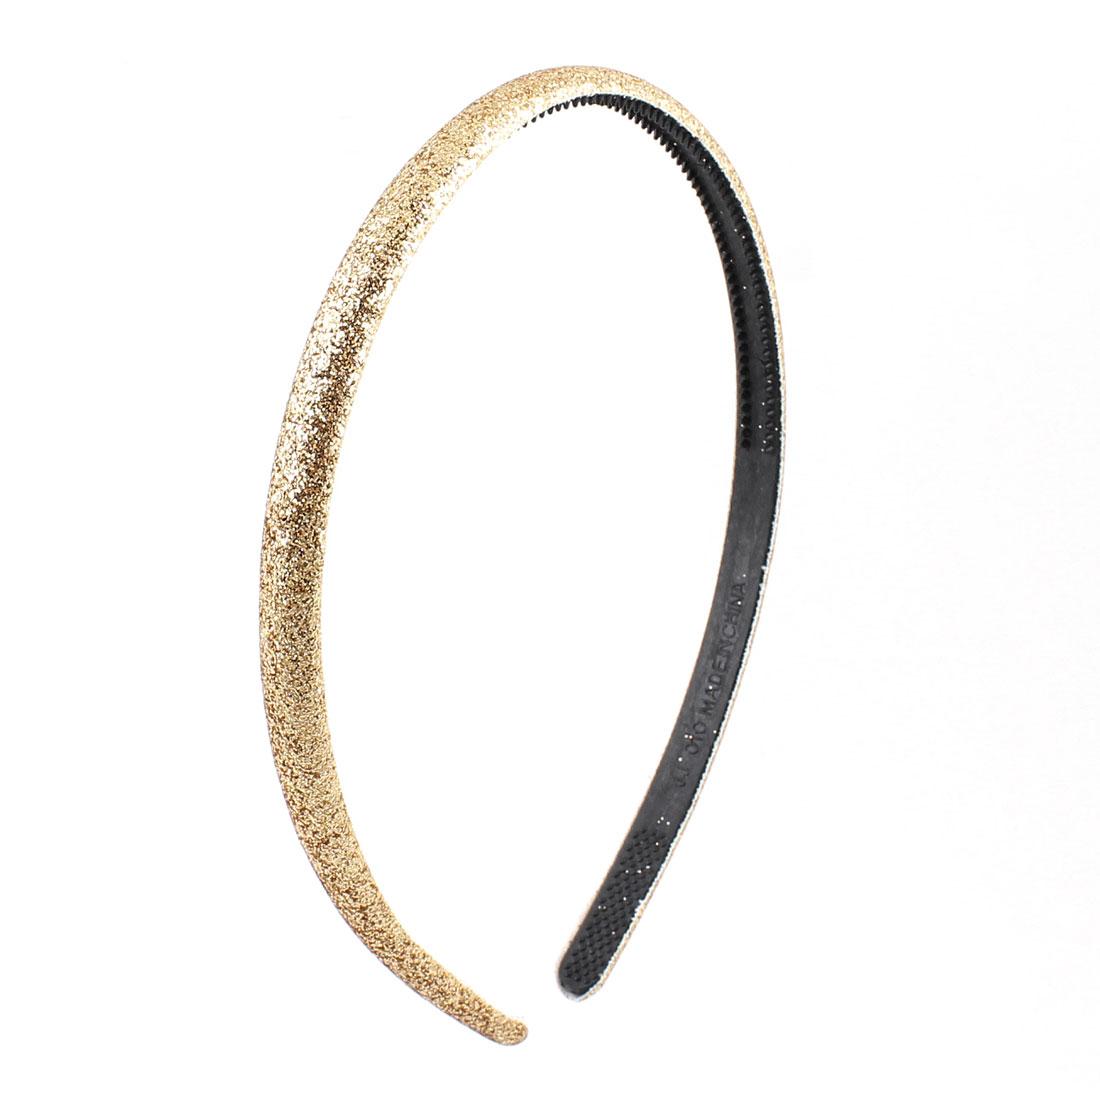 Lady Gold Tone Bling Plastic Slim Headband Hairband Hair Hoop